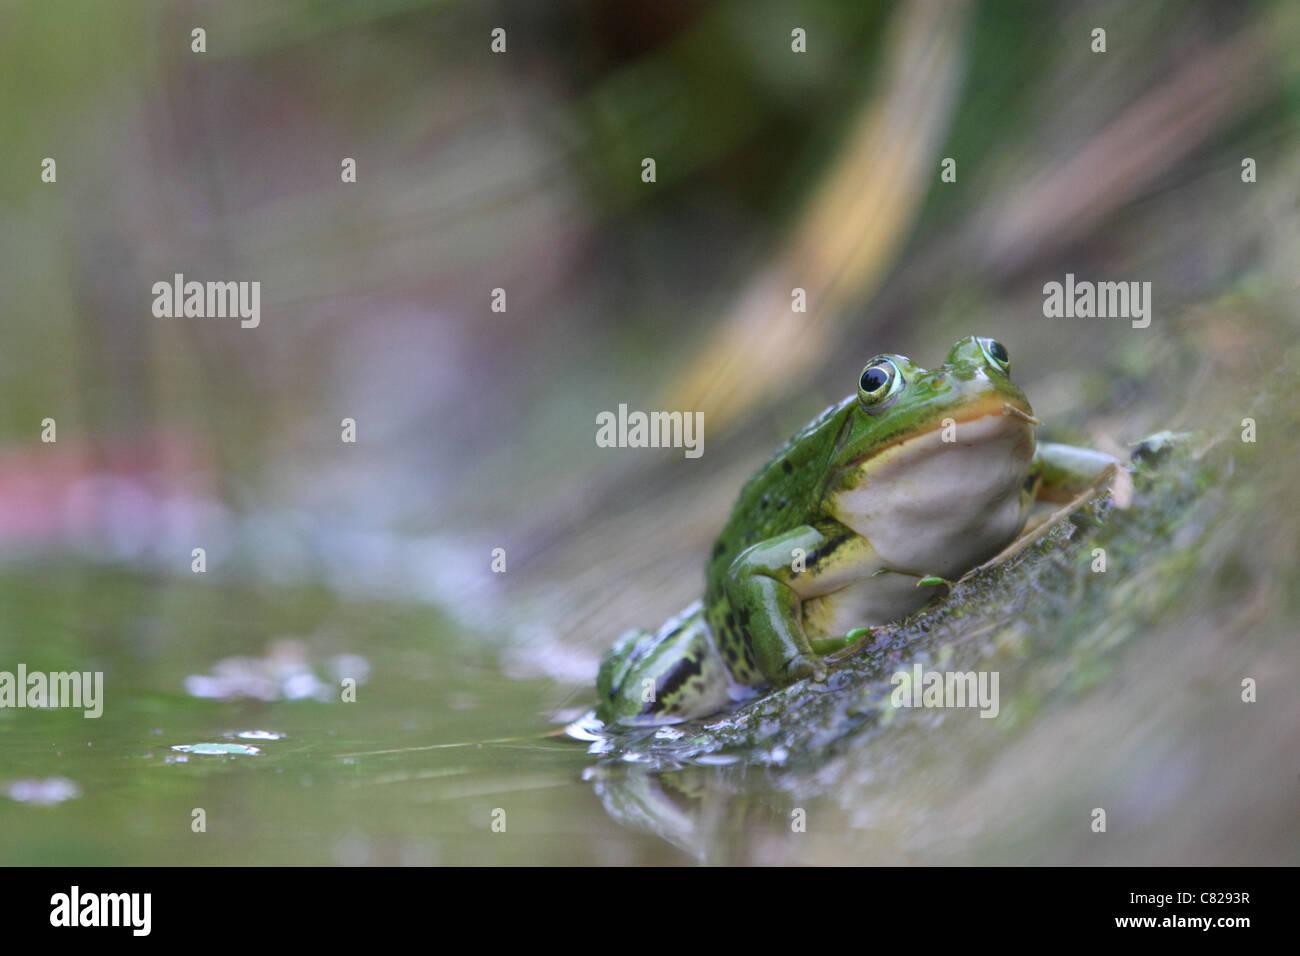 Waterfrog (Rana esculenta). Europe - Stock Image